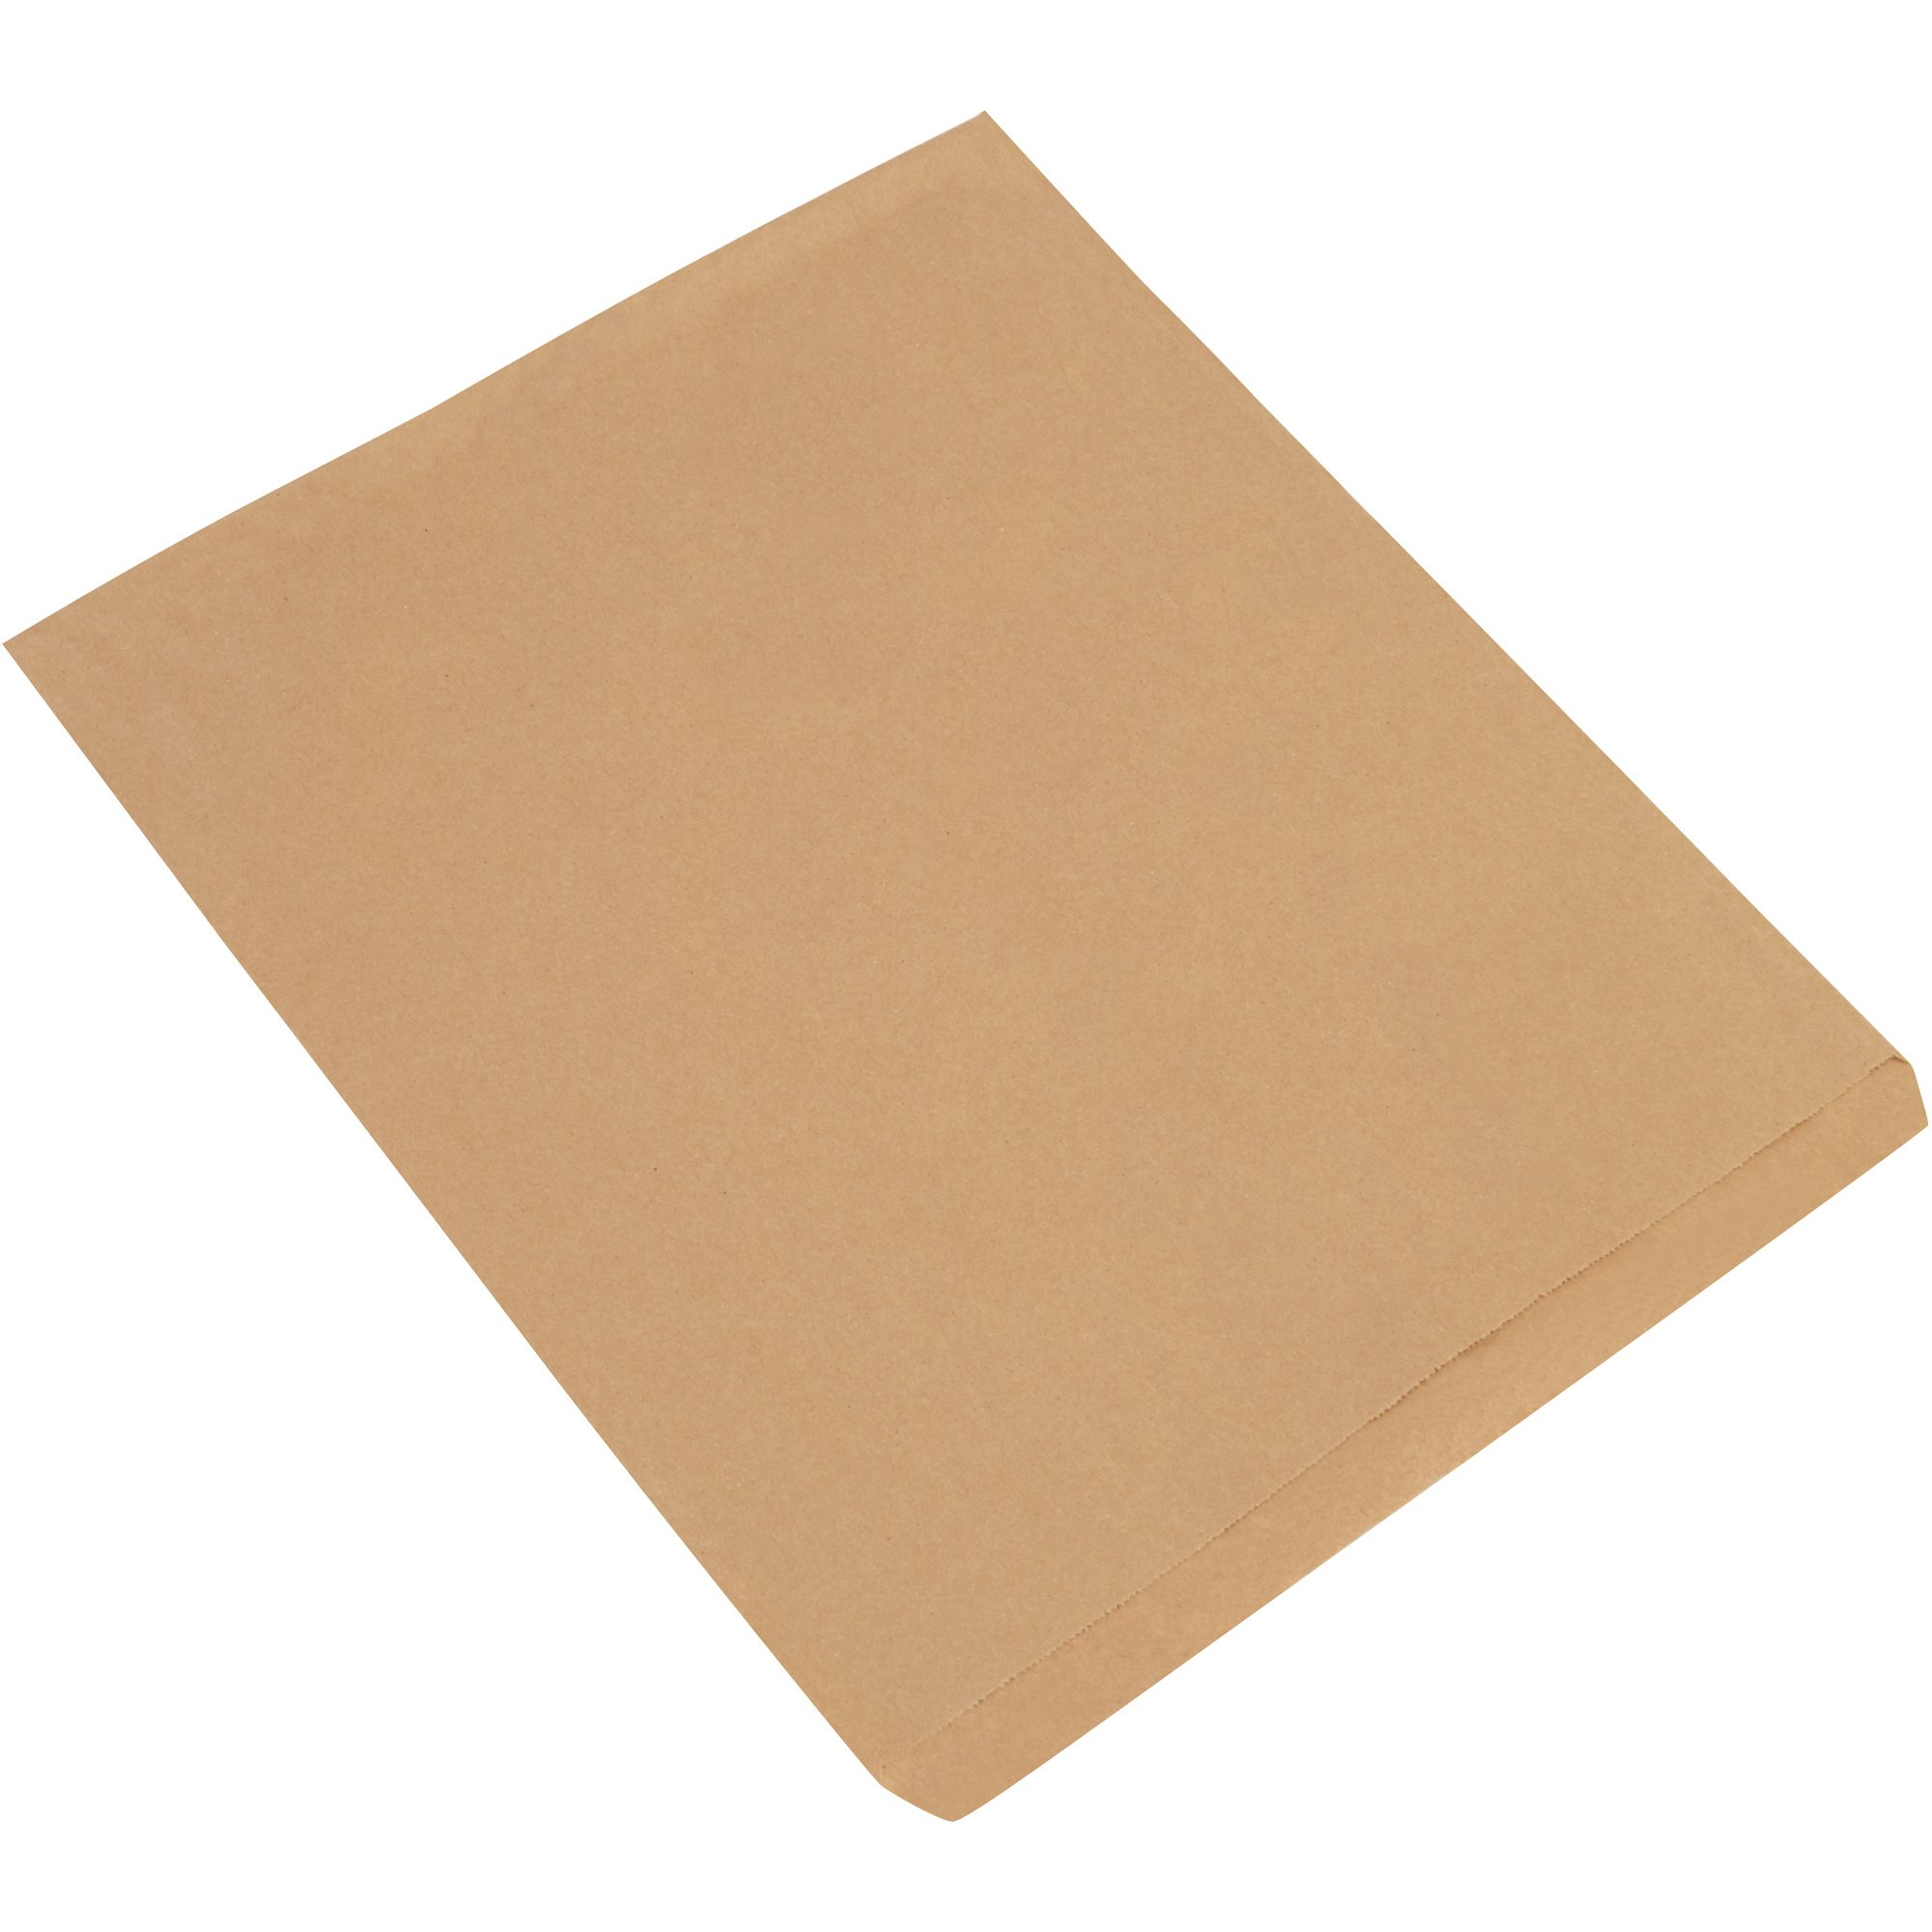 Aviditi BGM106K Flat Merchandise Bags, 15'' x 18'', Kraft (Pack of 500)